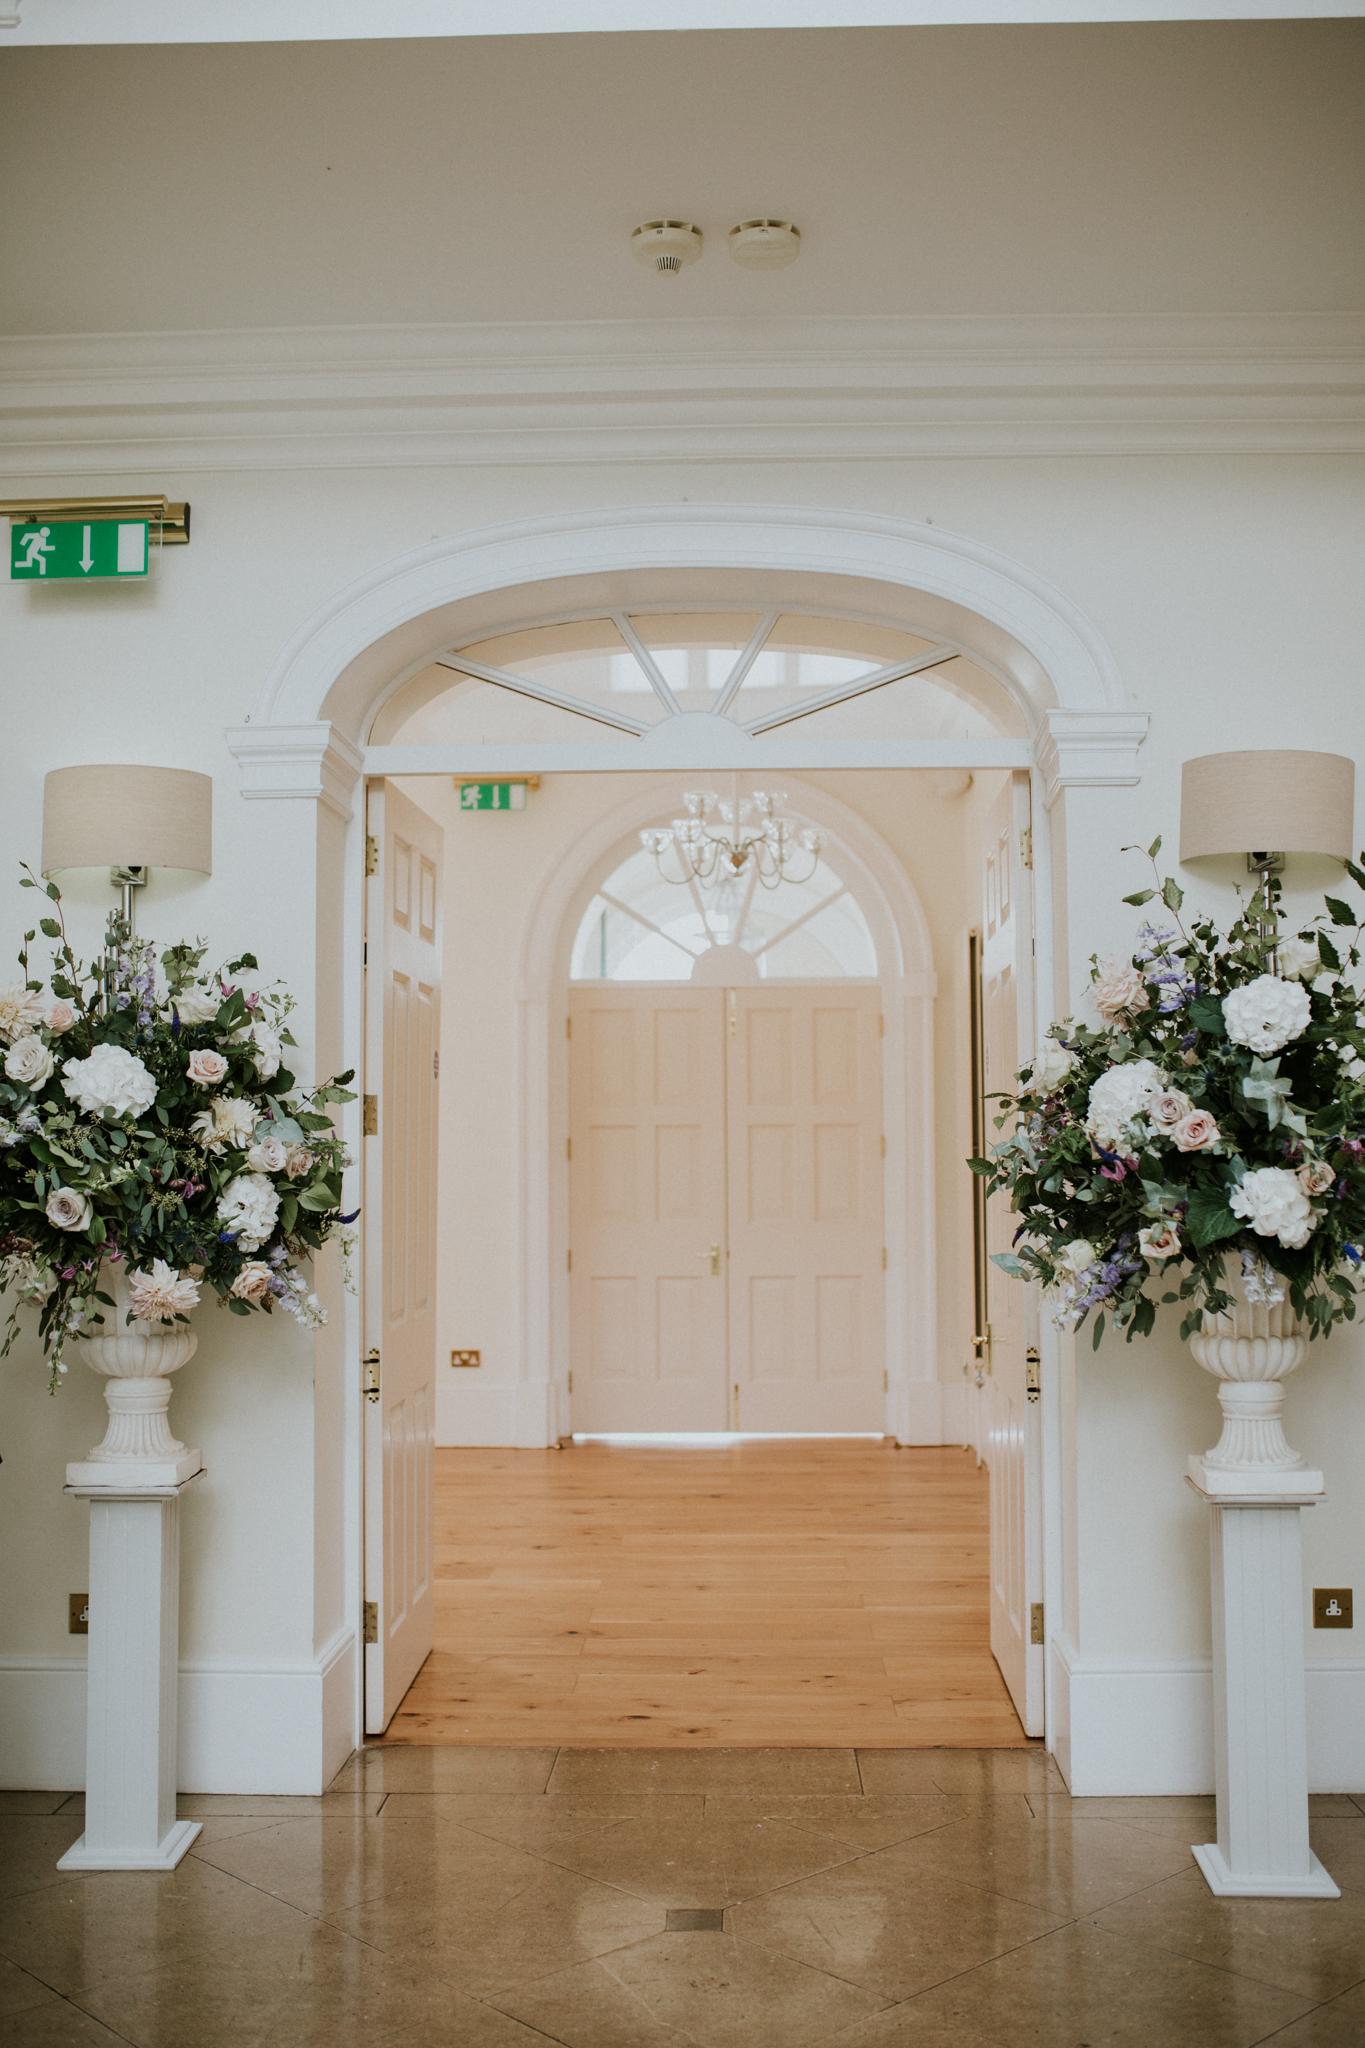 Daisy lane Floral Design Large urn arrangements